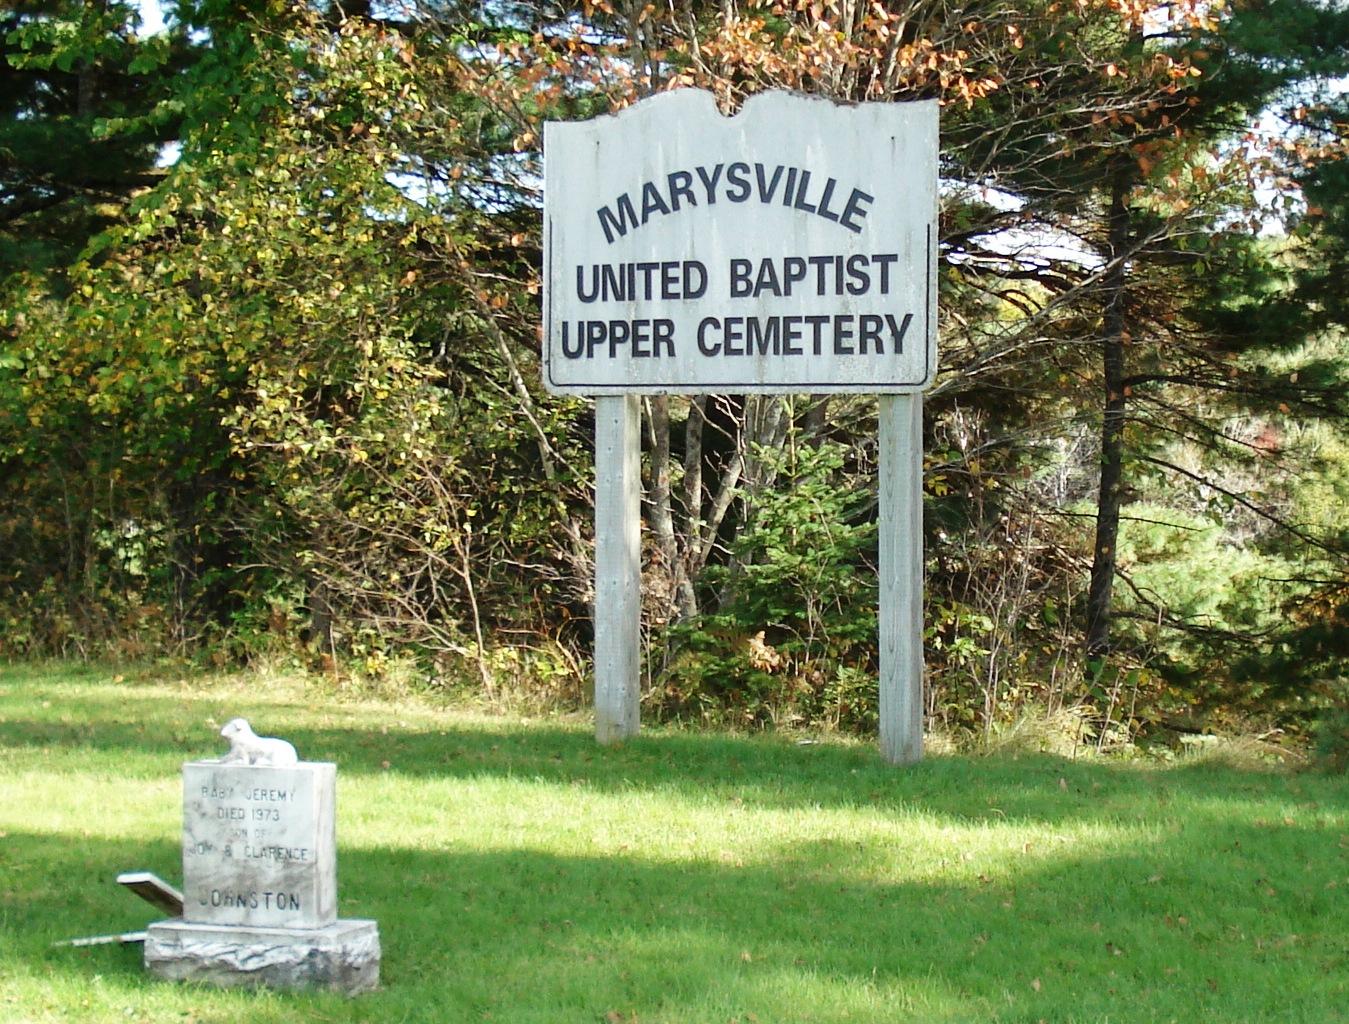 Marysville United Baptist Church Cemetery